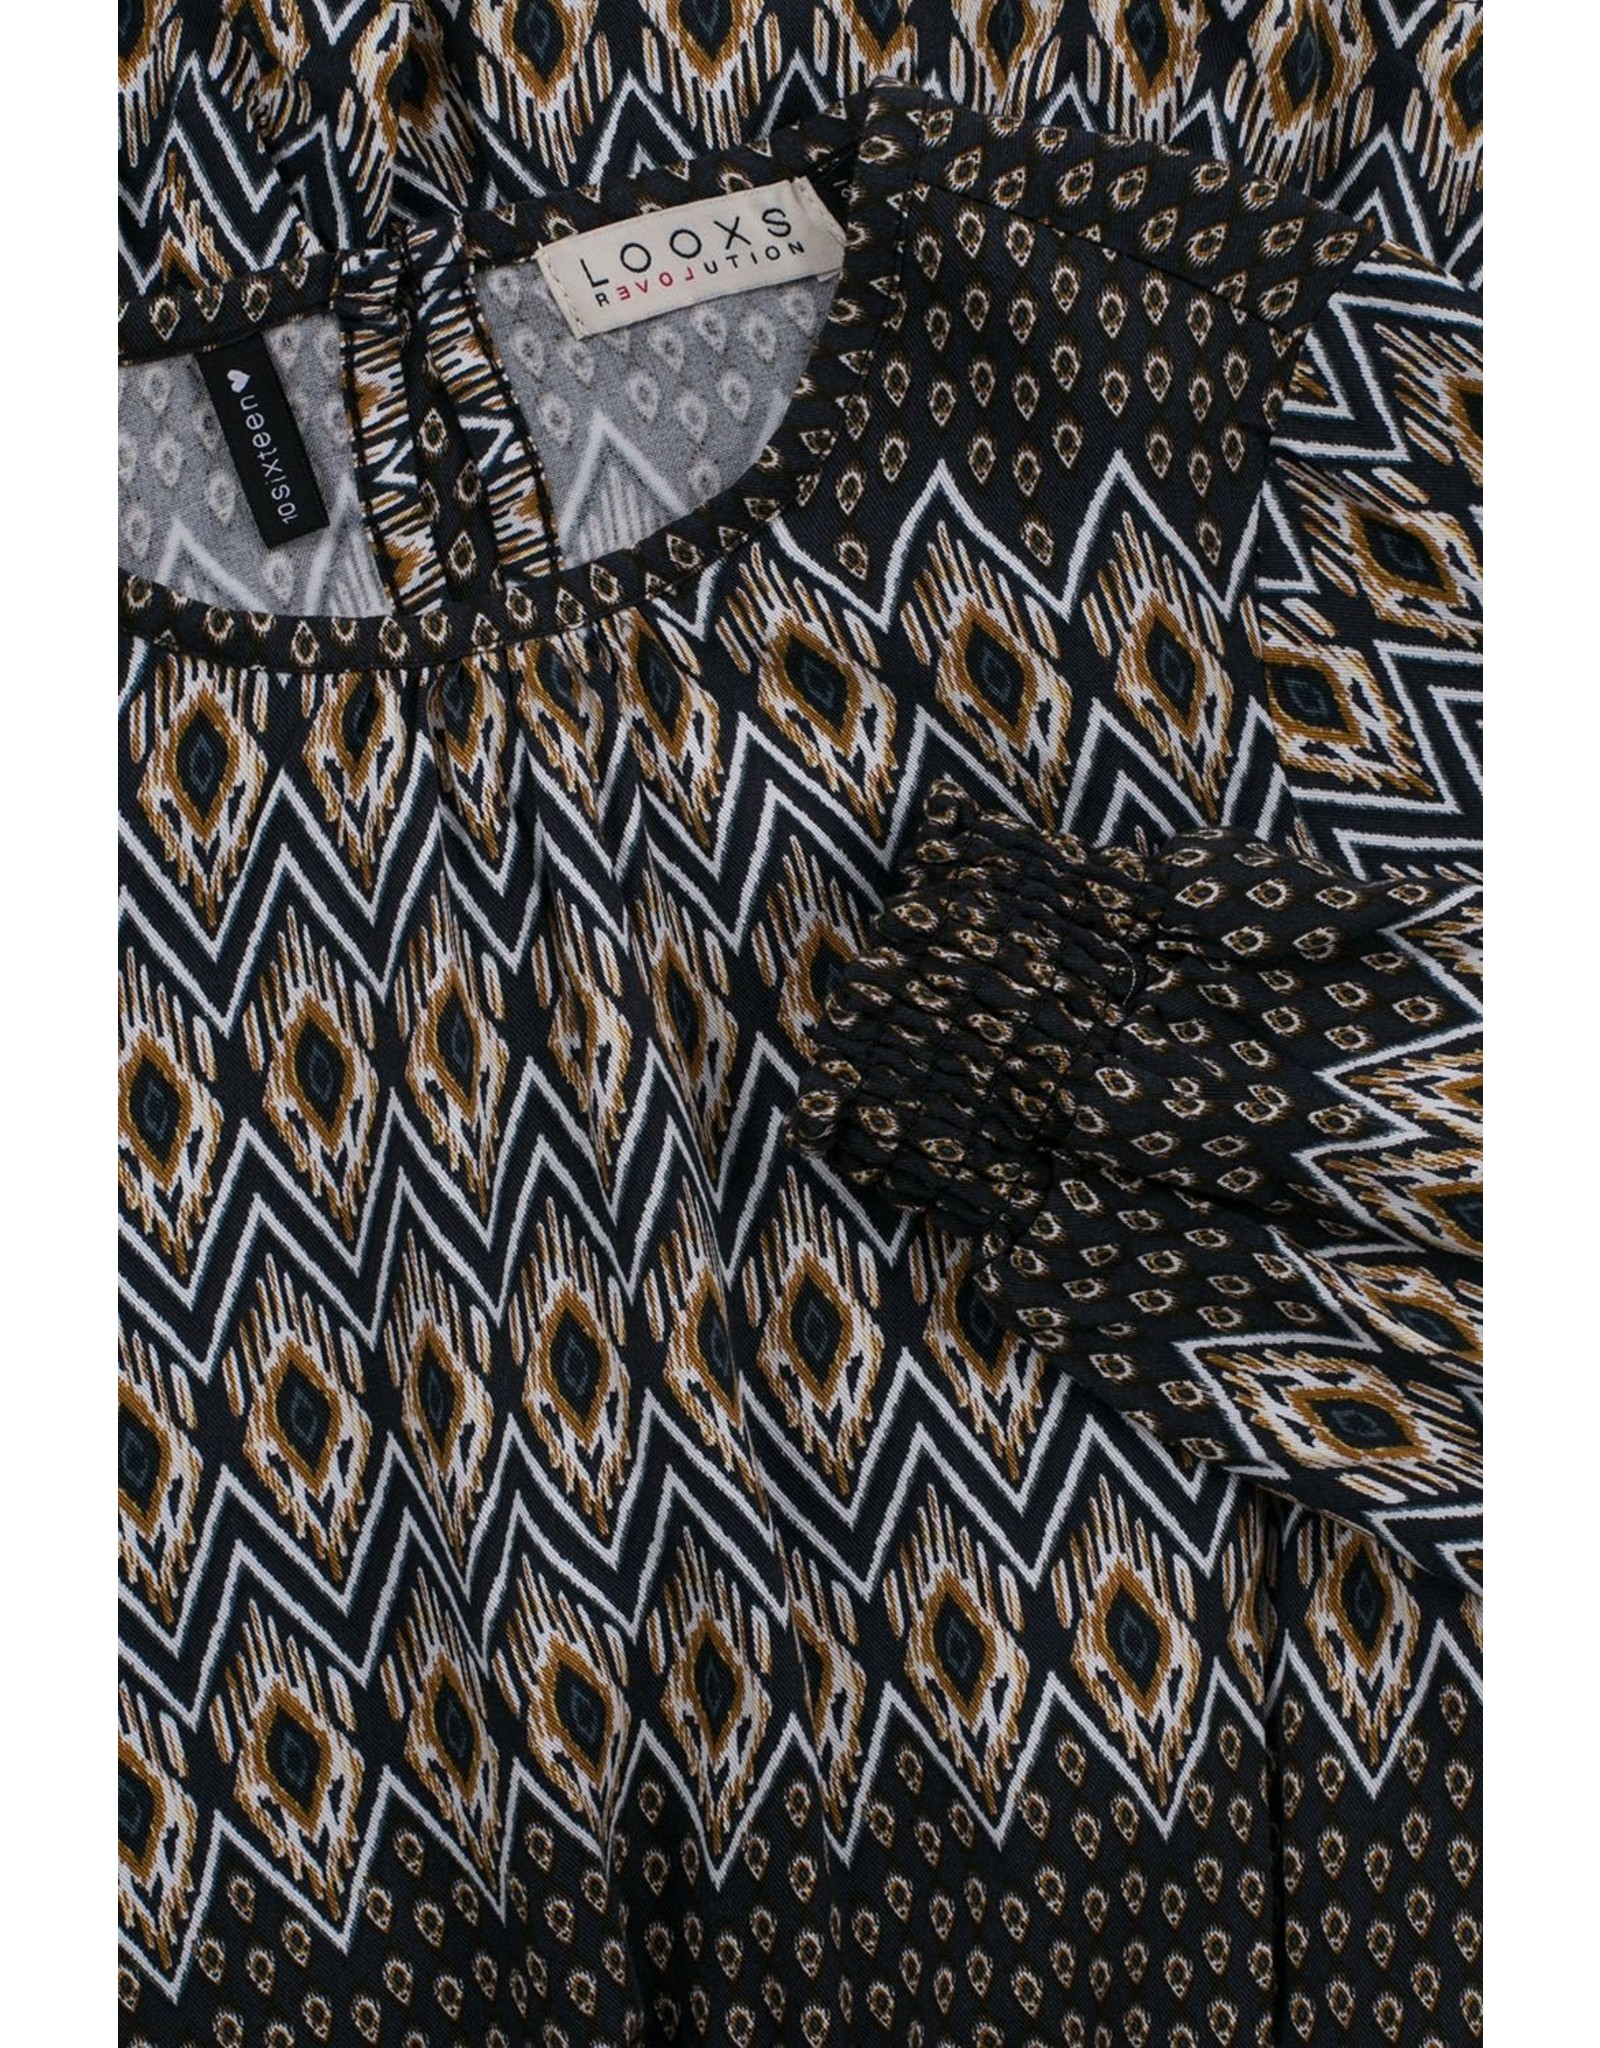 Looxs 10SIXTEEN 10Sixteen Native printed dress